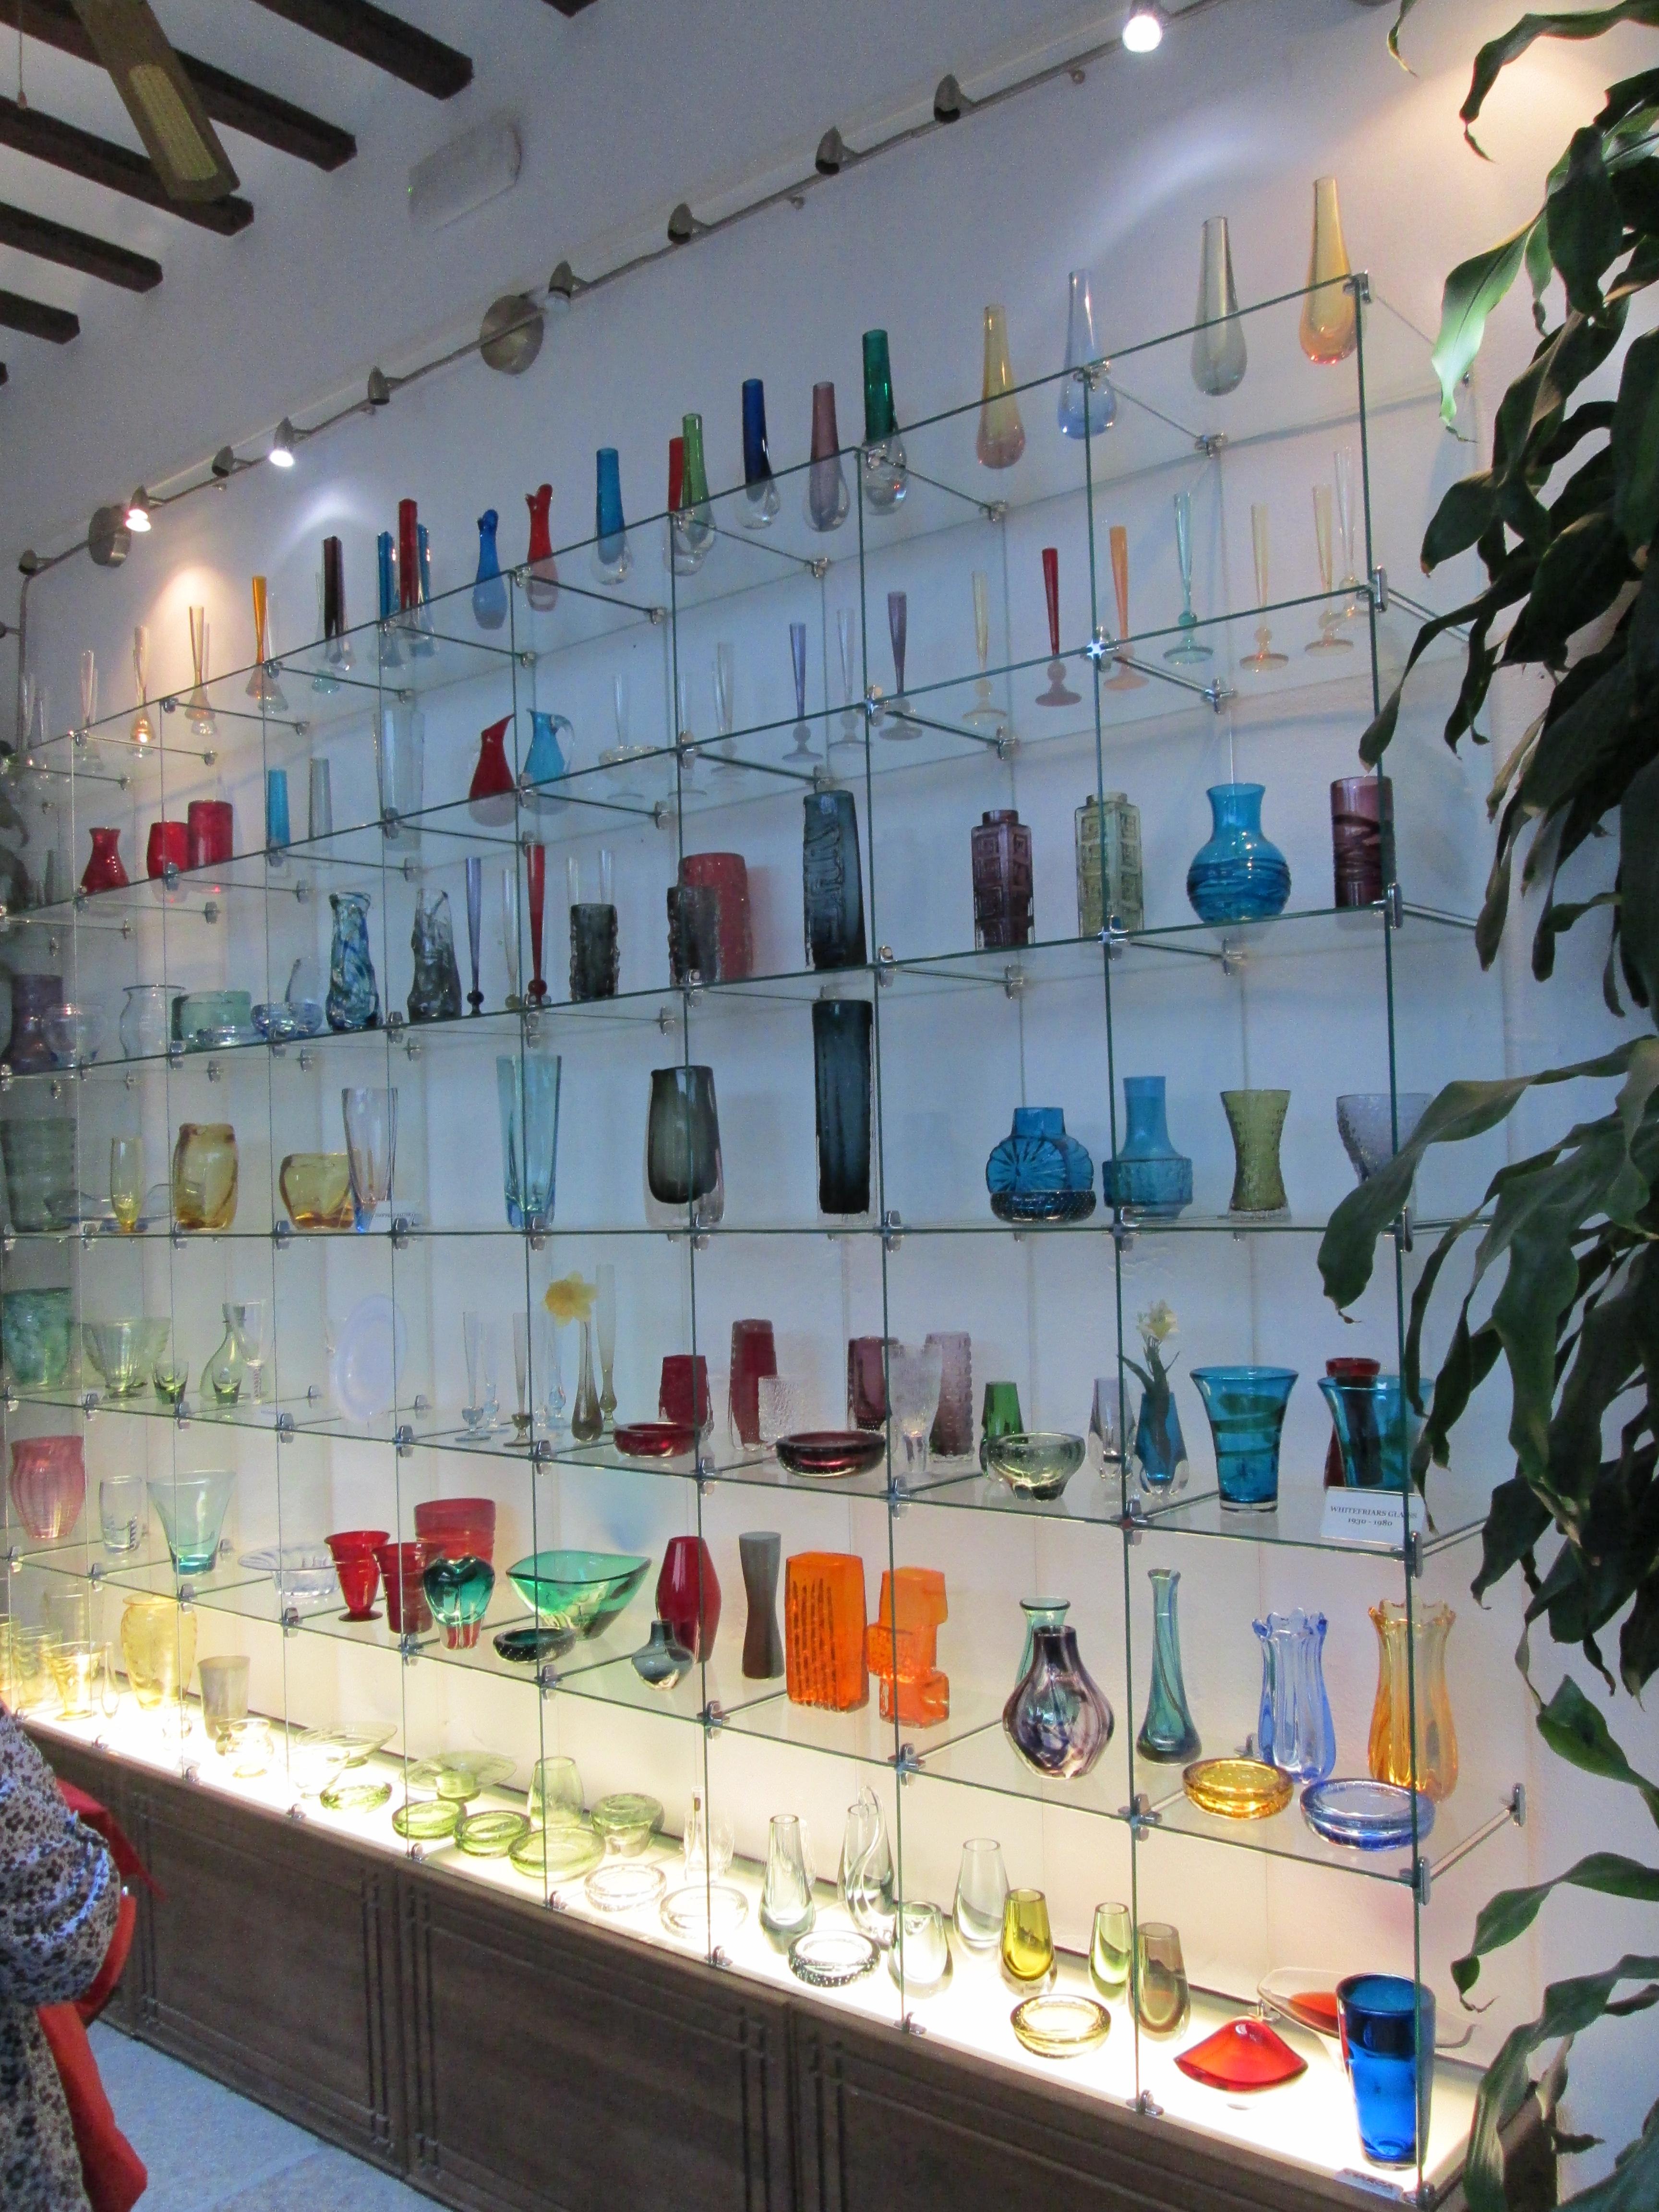 File:Museo del Vidrio y Cristal-stand.jpg - Wikimedia Commons